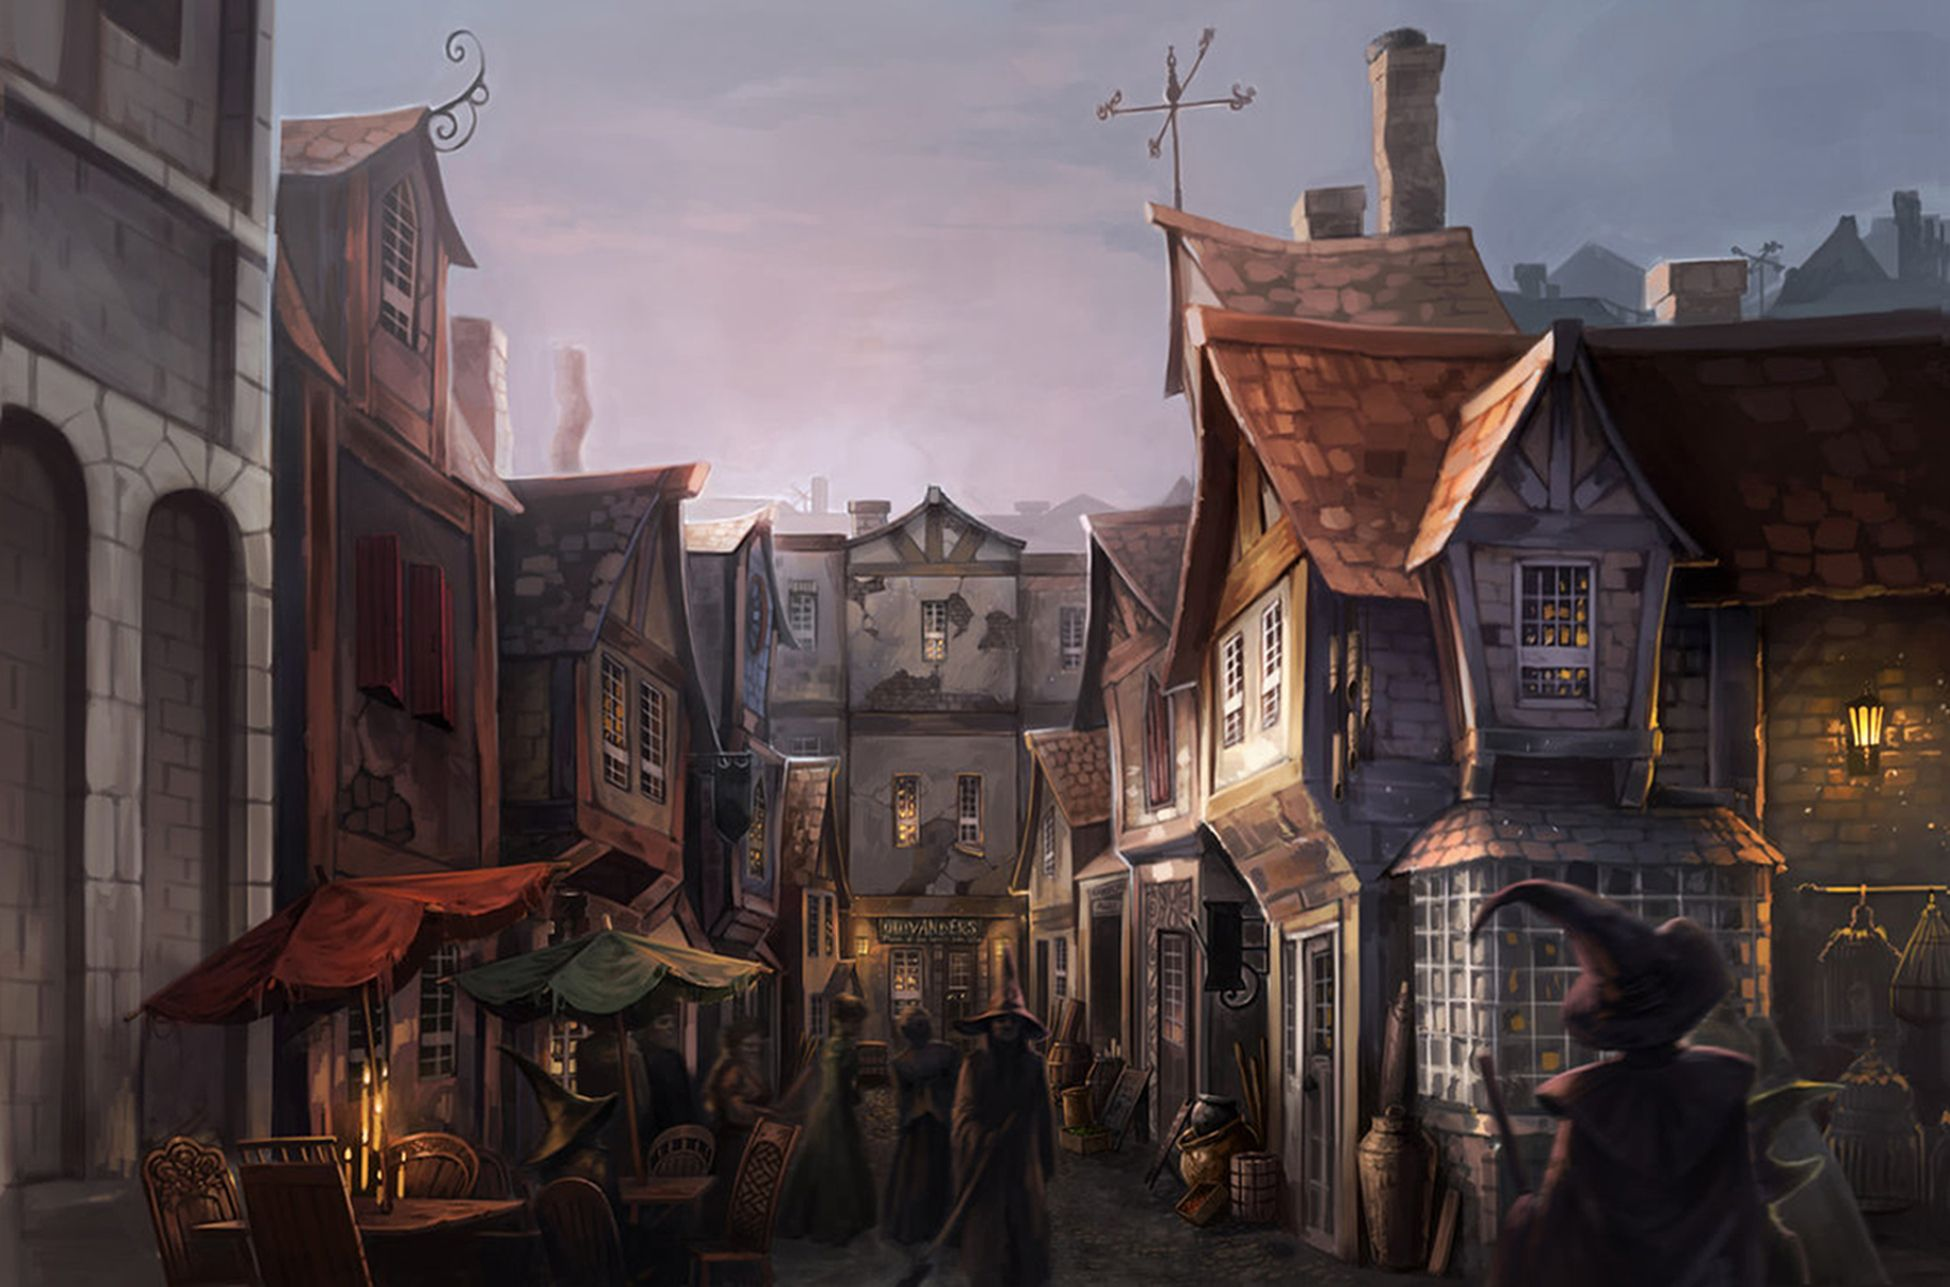 Good Wallpaper Harry Potter Fanart - 006b9ed602032cc8ce4af7e3369bb5d8  HD_21393.jpg